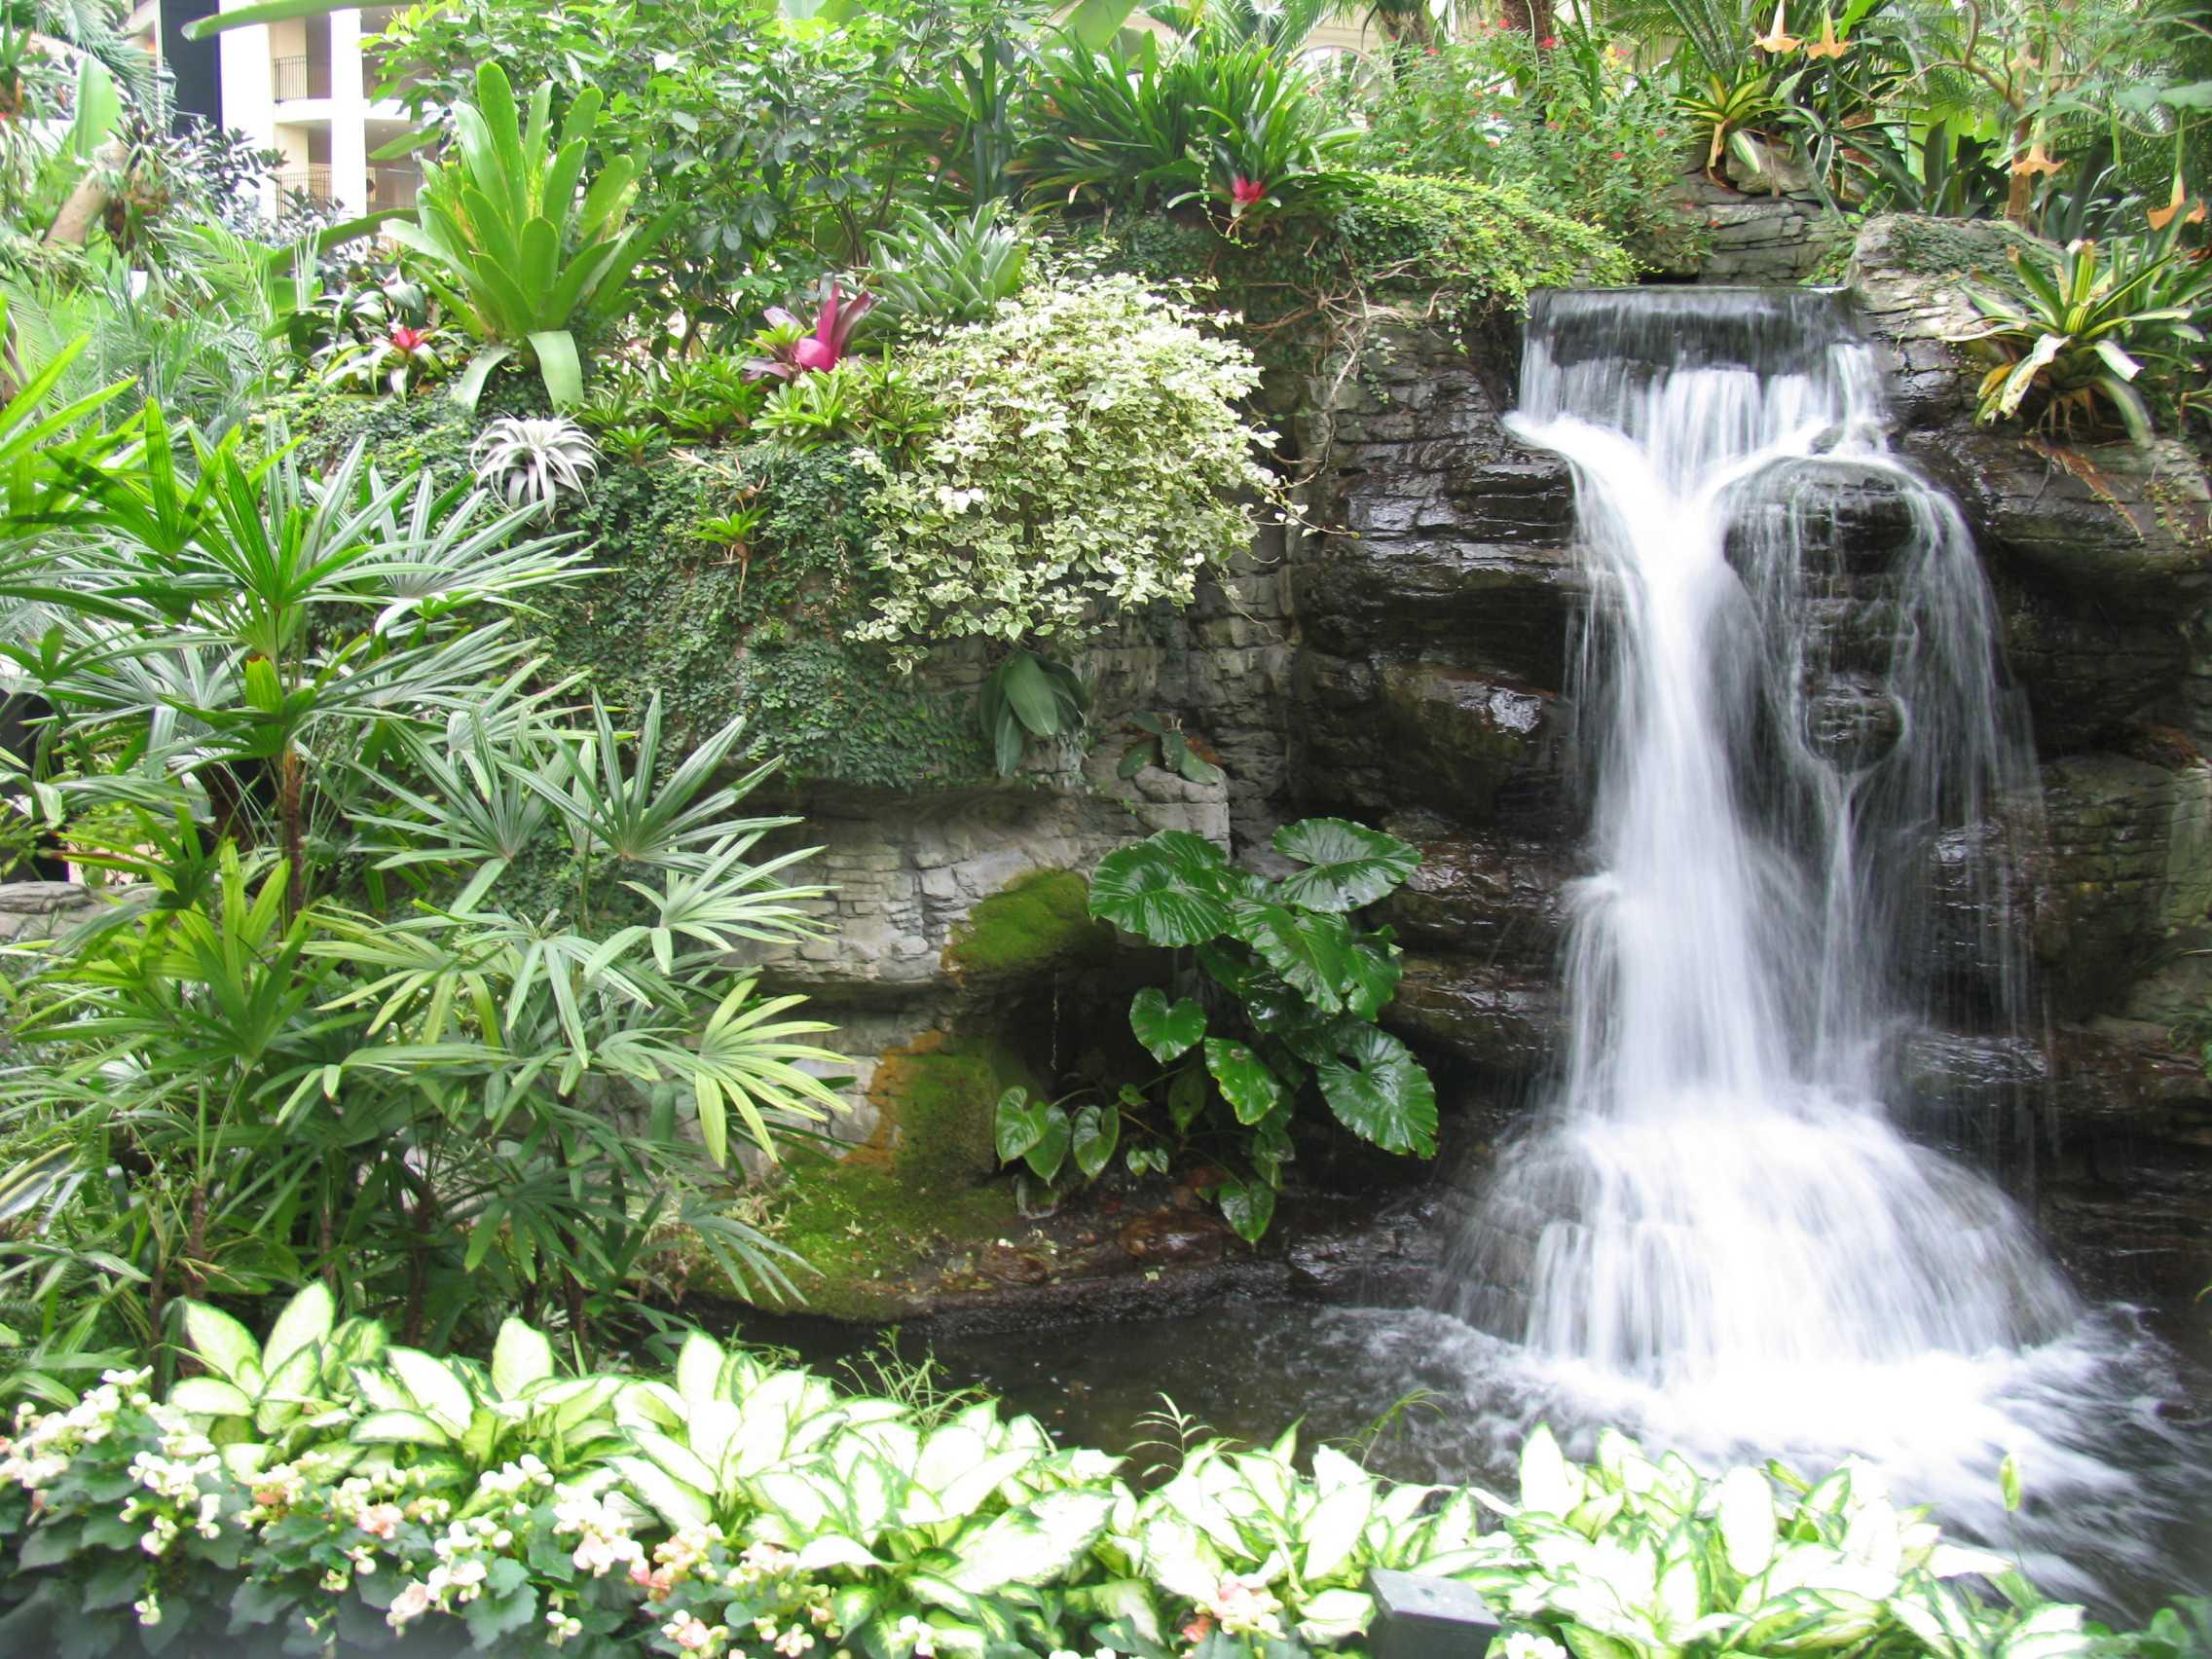 Фото водопадов в саду